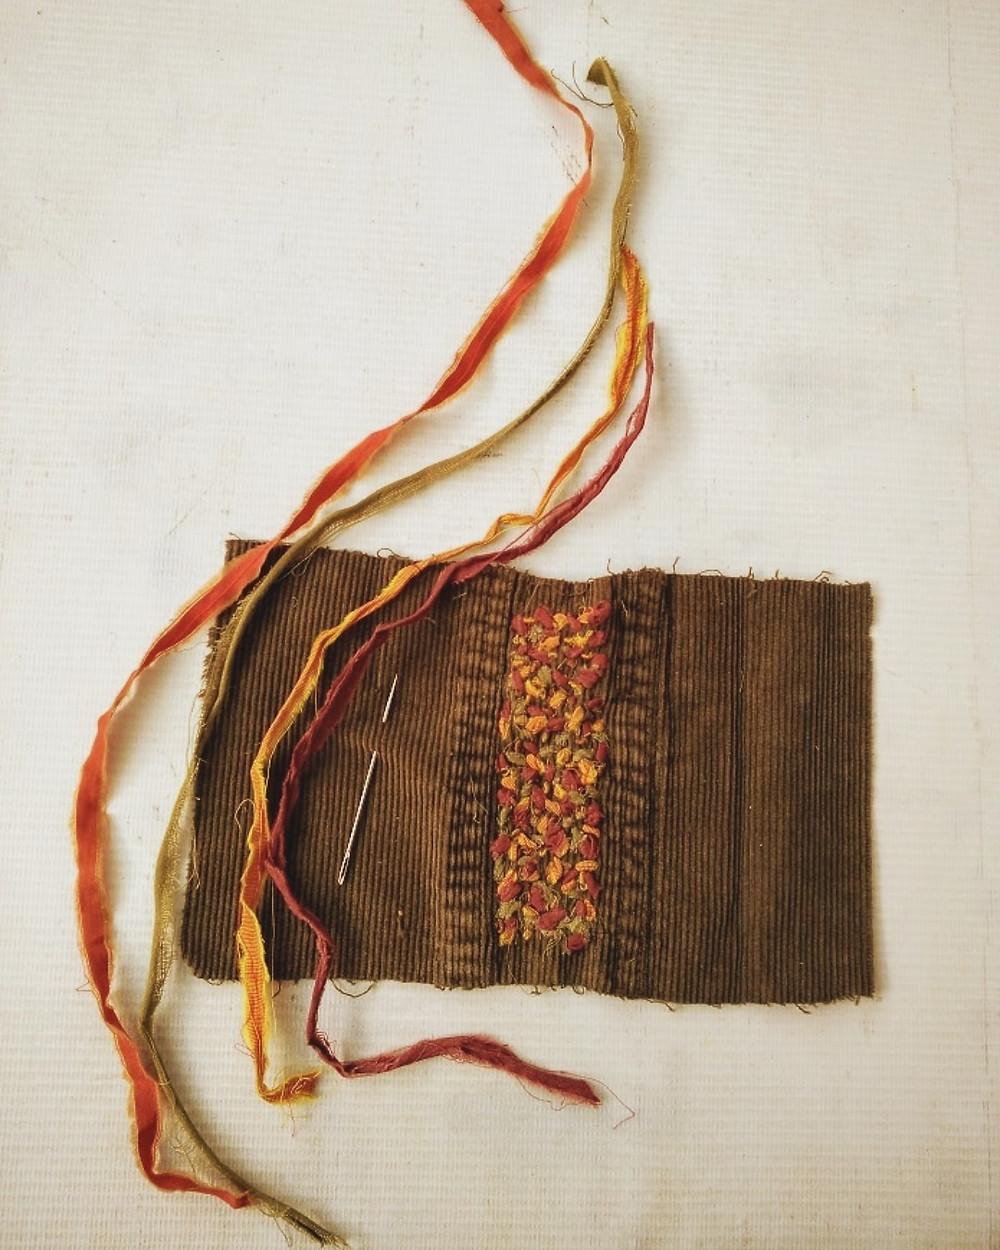 Threads from scrap fabrics